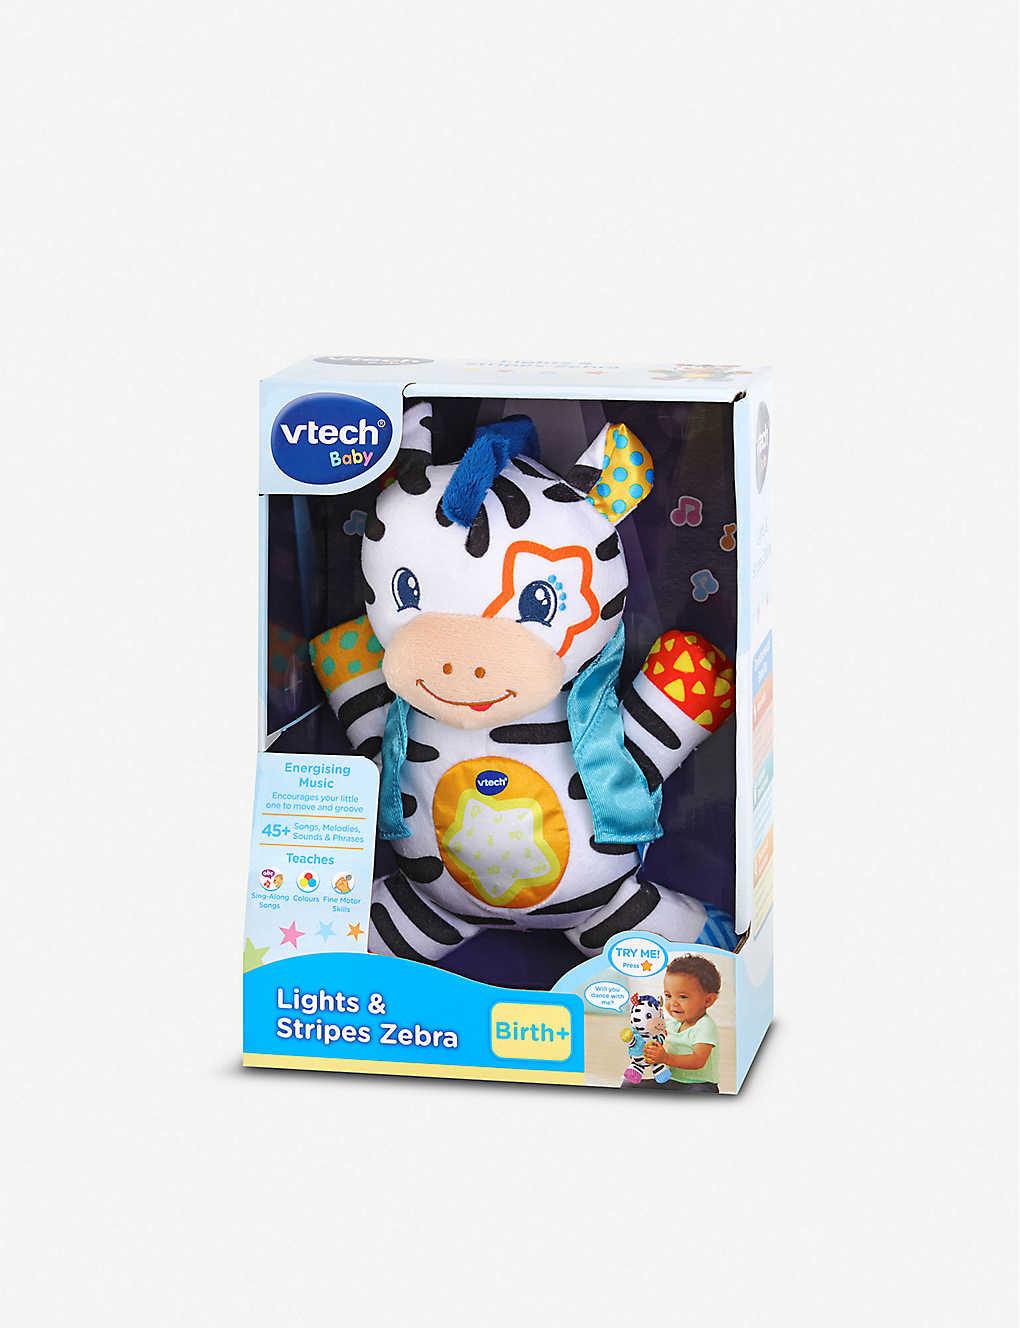 Vtech Lights And Stripes Zebra Baby Toy Selfridges Com